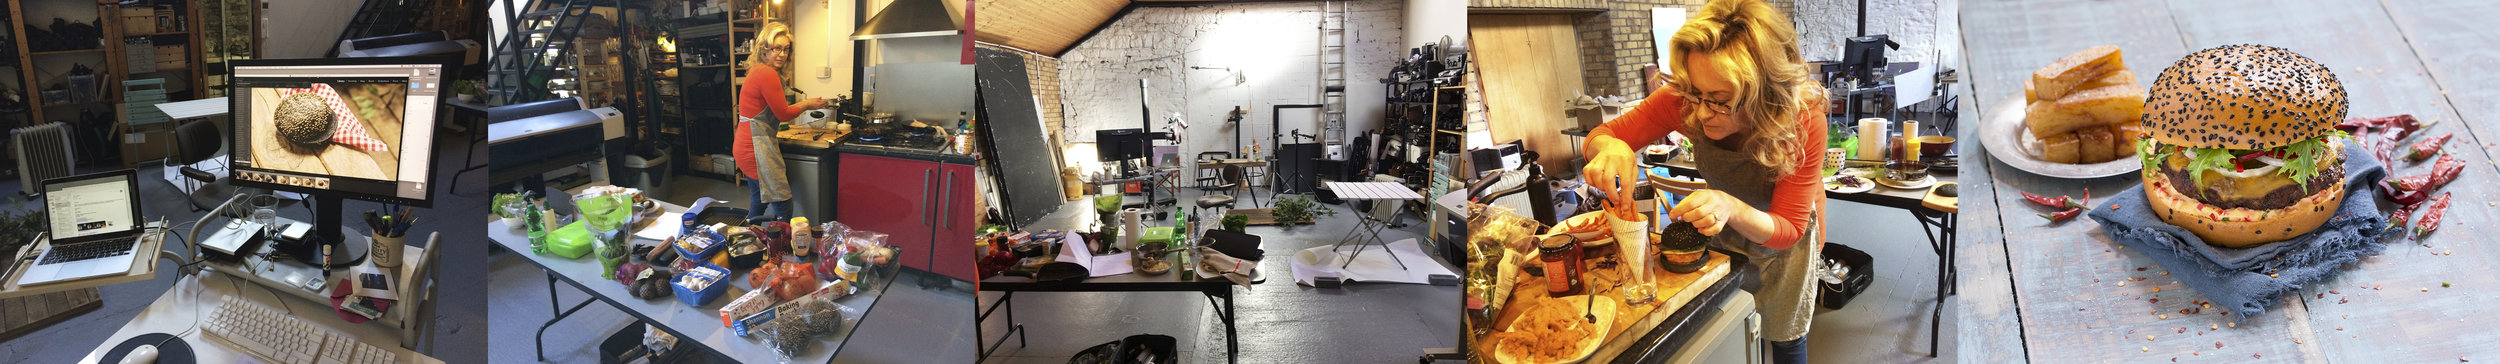 Working in the studio.